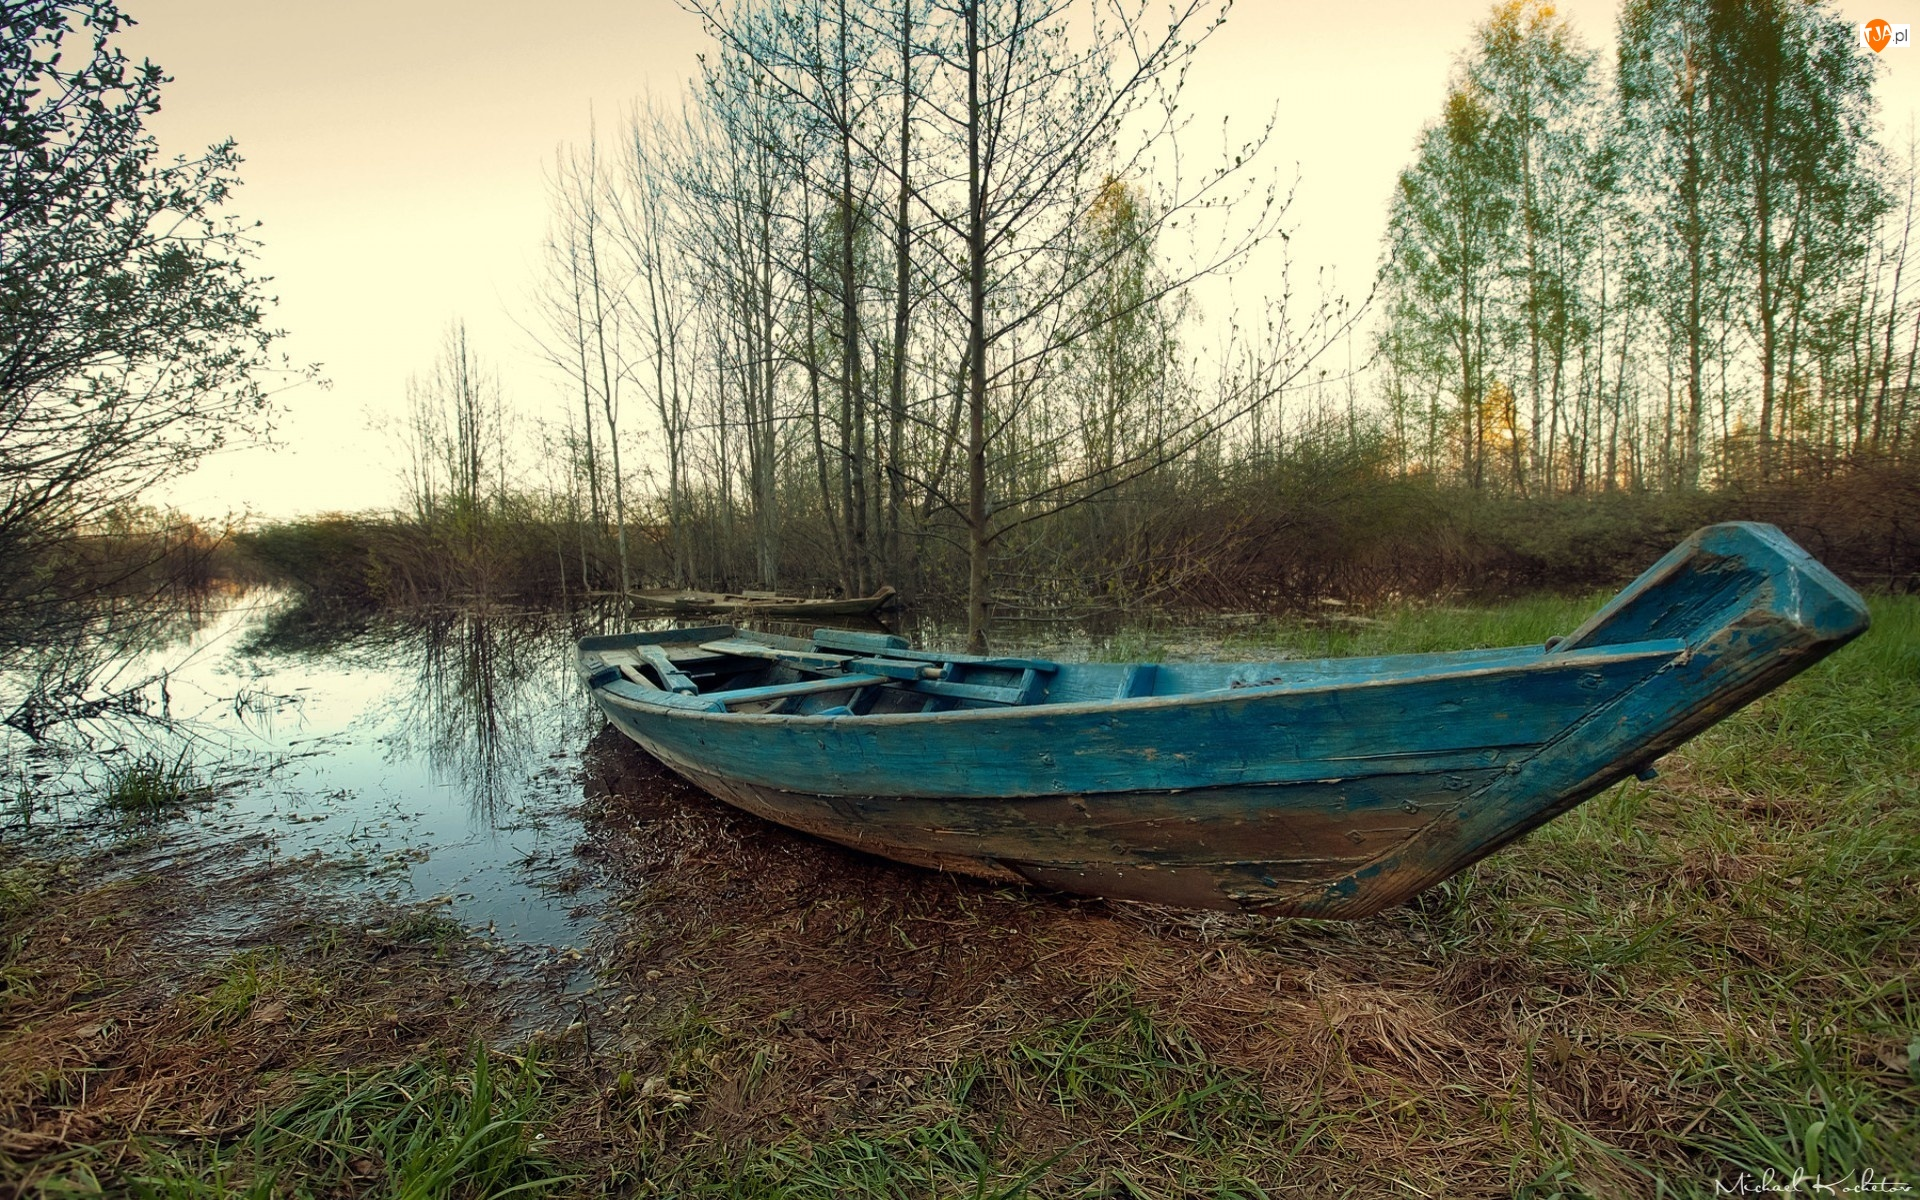 Bagno, Jesień, Łódź, Drzewa